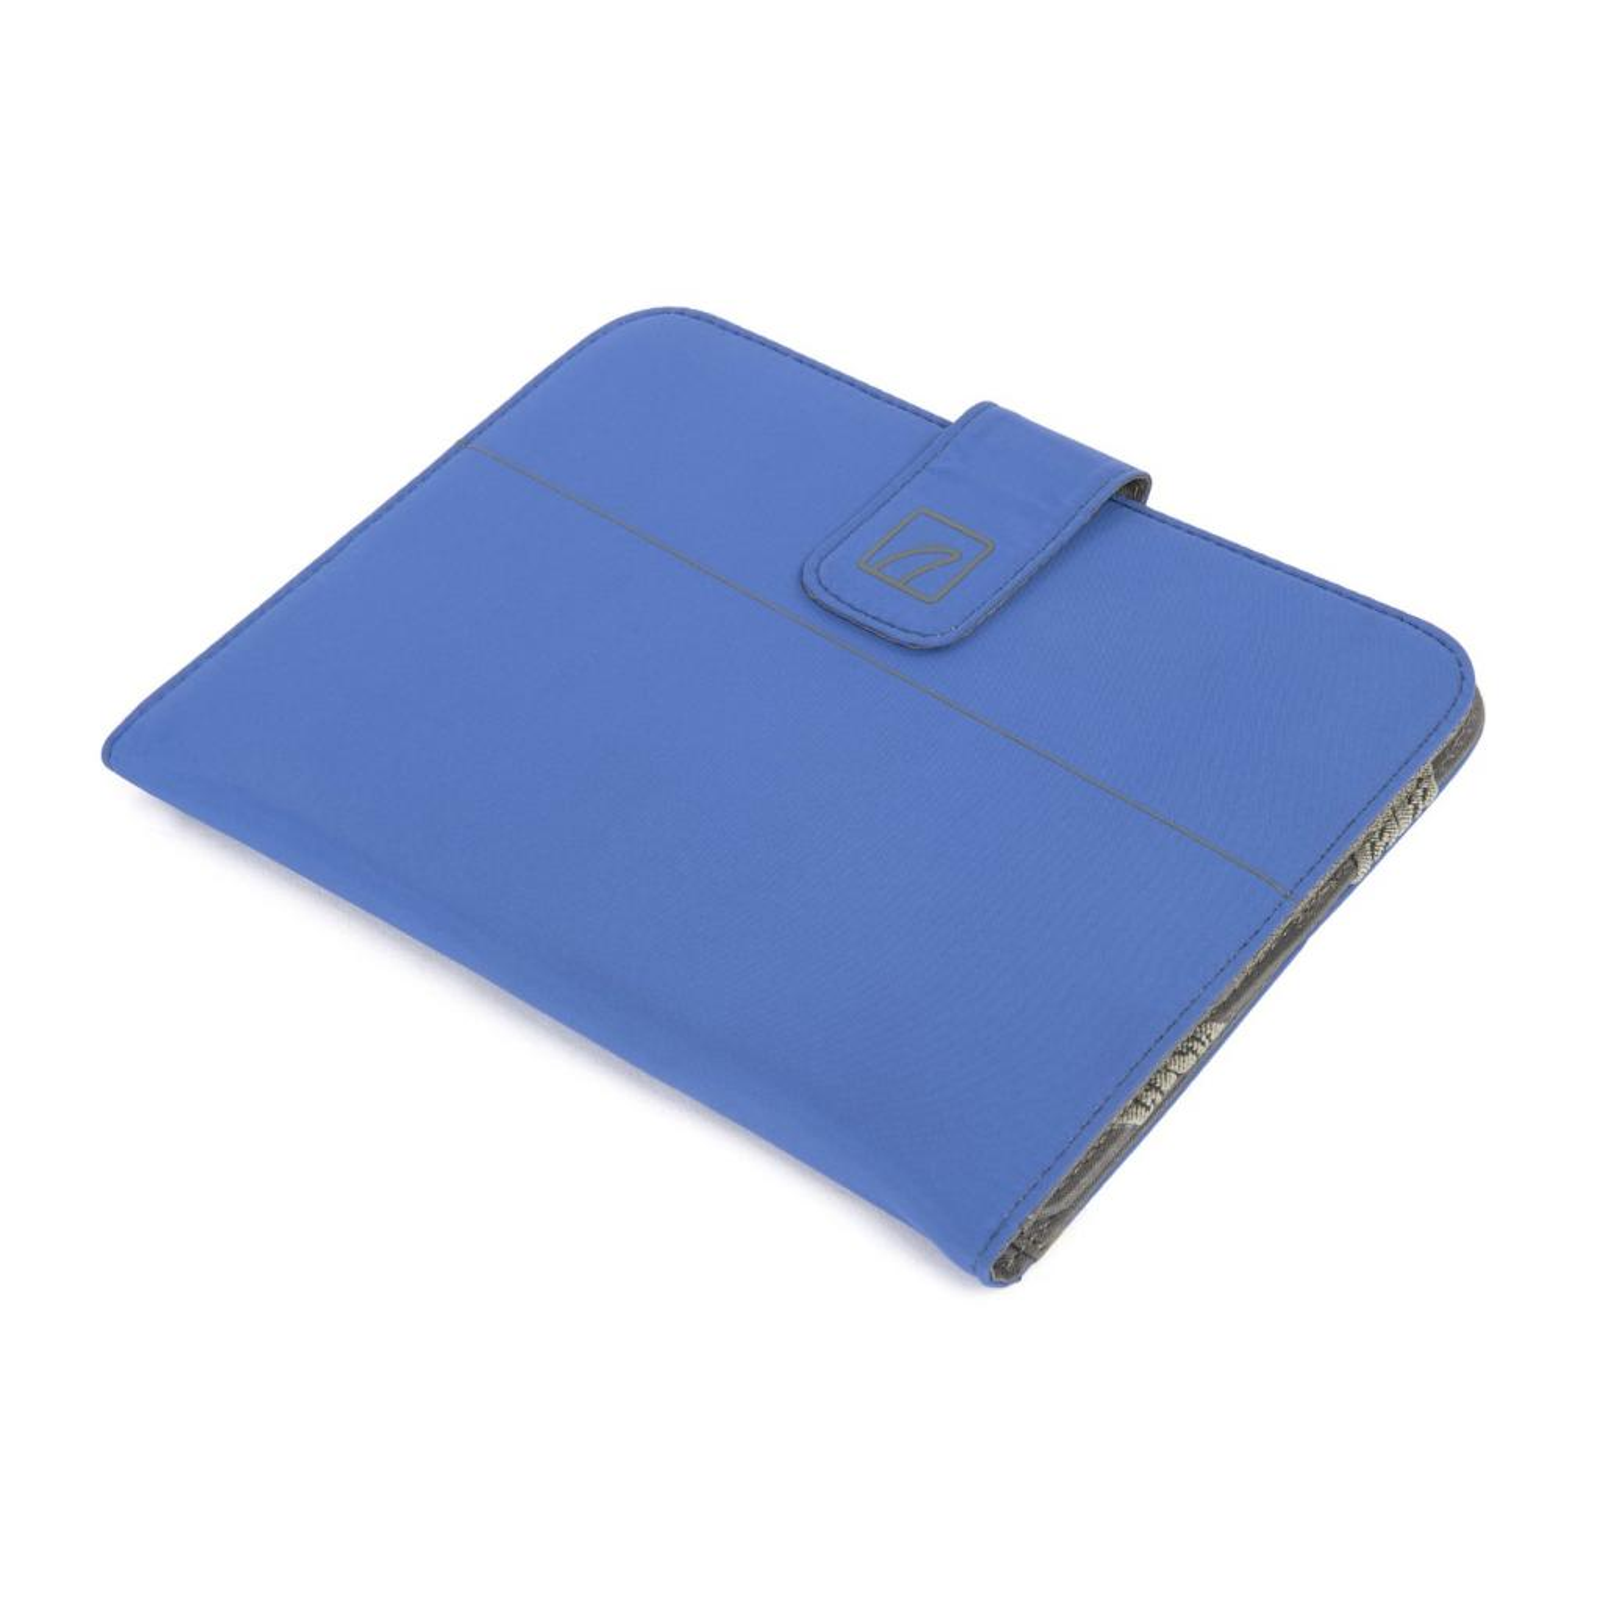 "Чехол для планшета Tucano 7"" Facile Stand Blue (TAB-FA7-B) изображение 4"